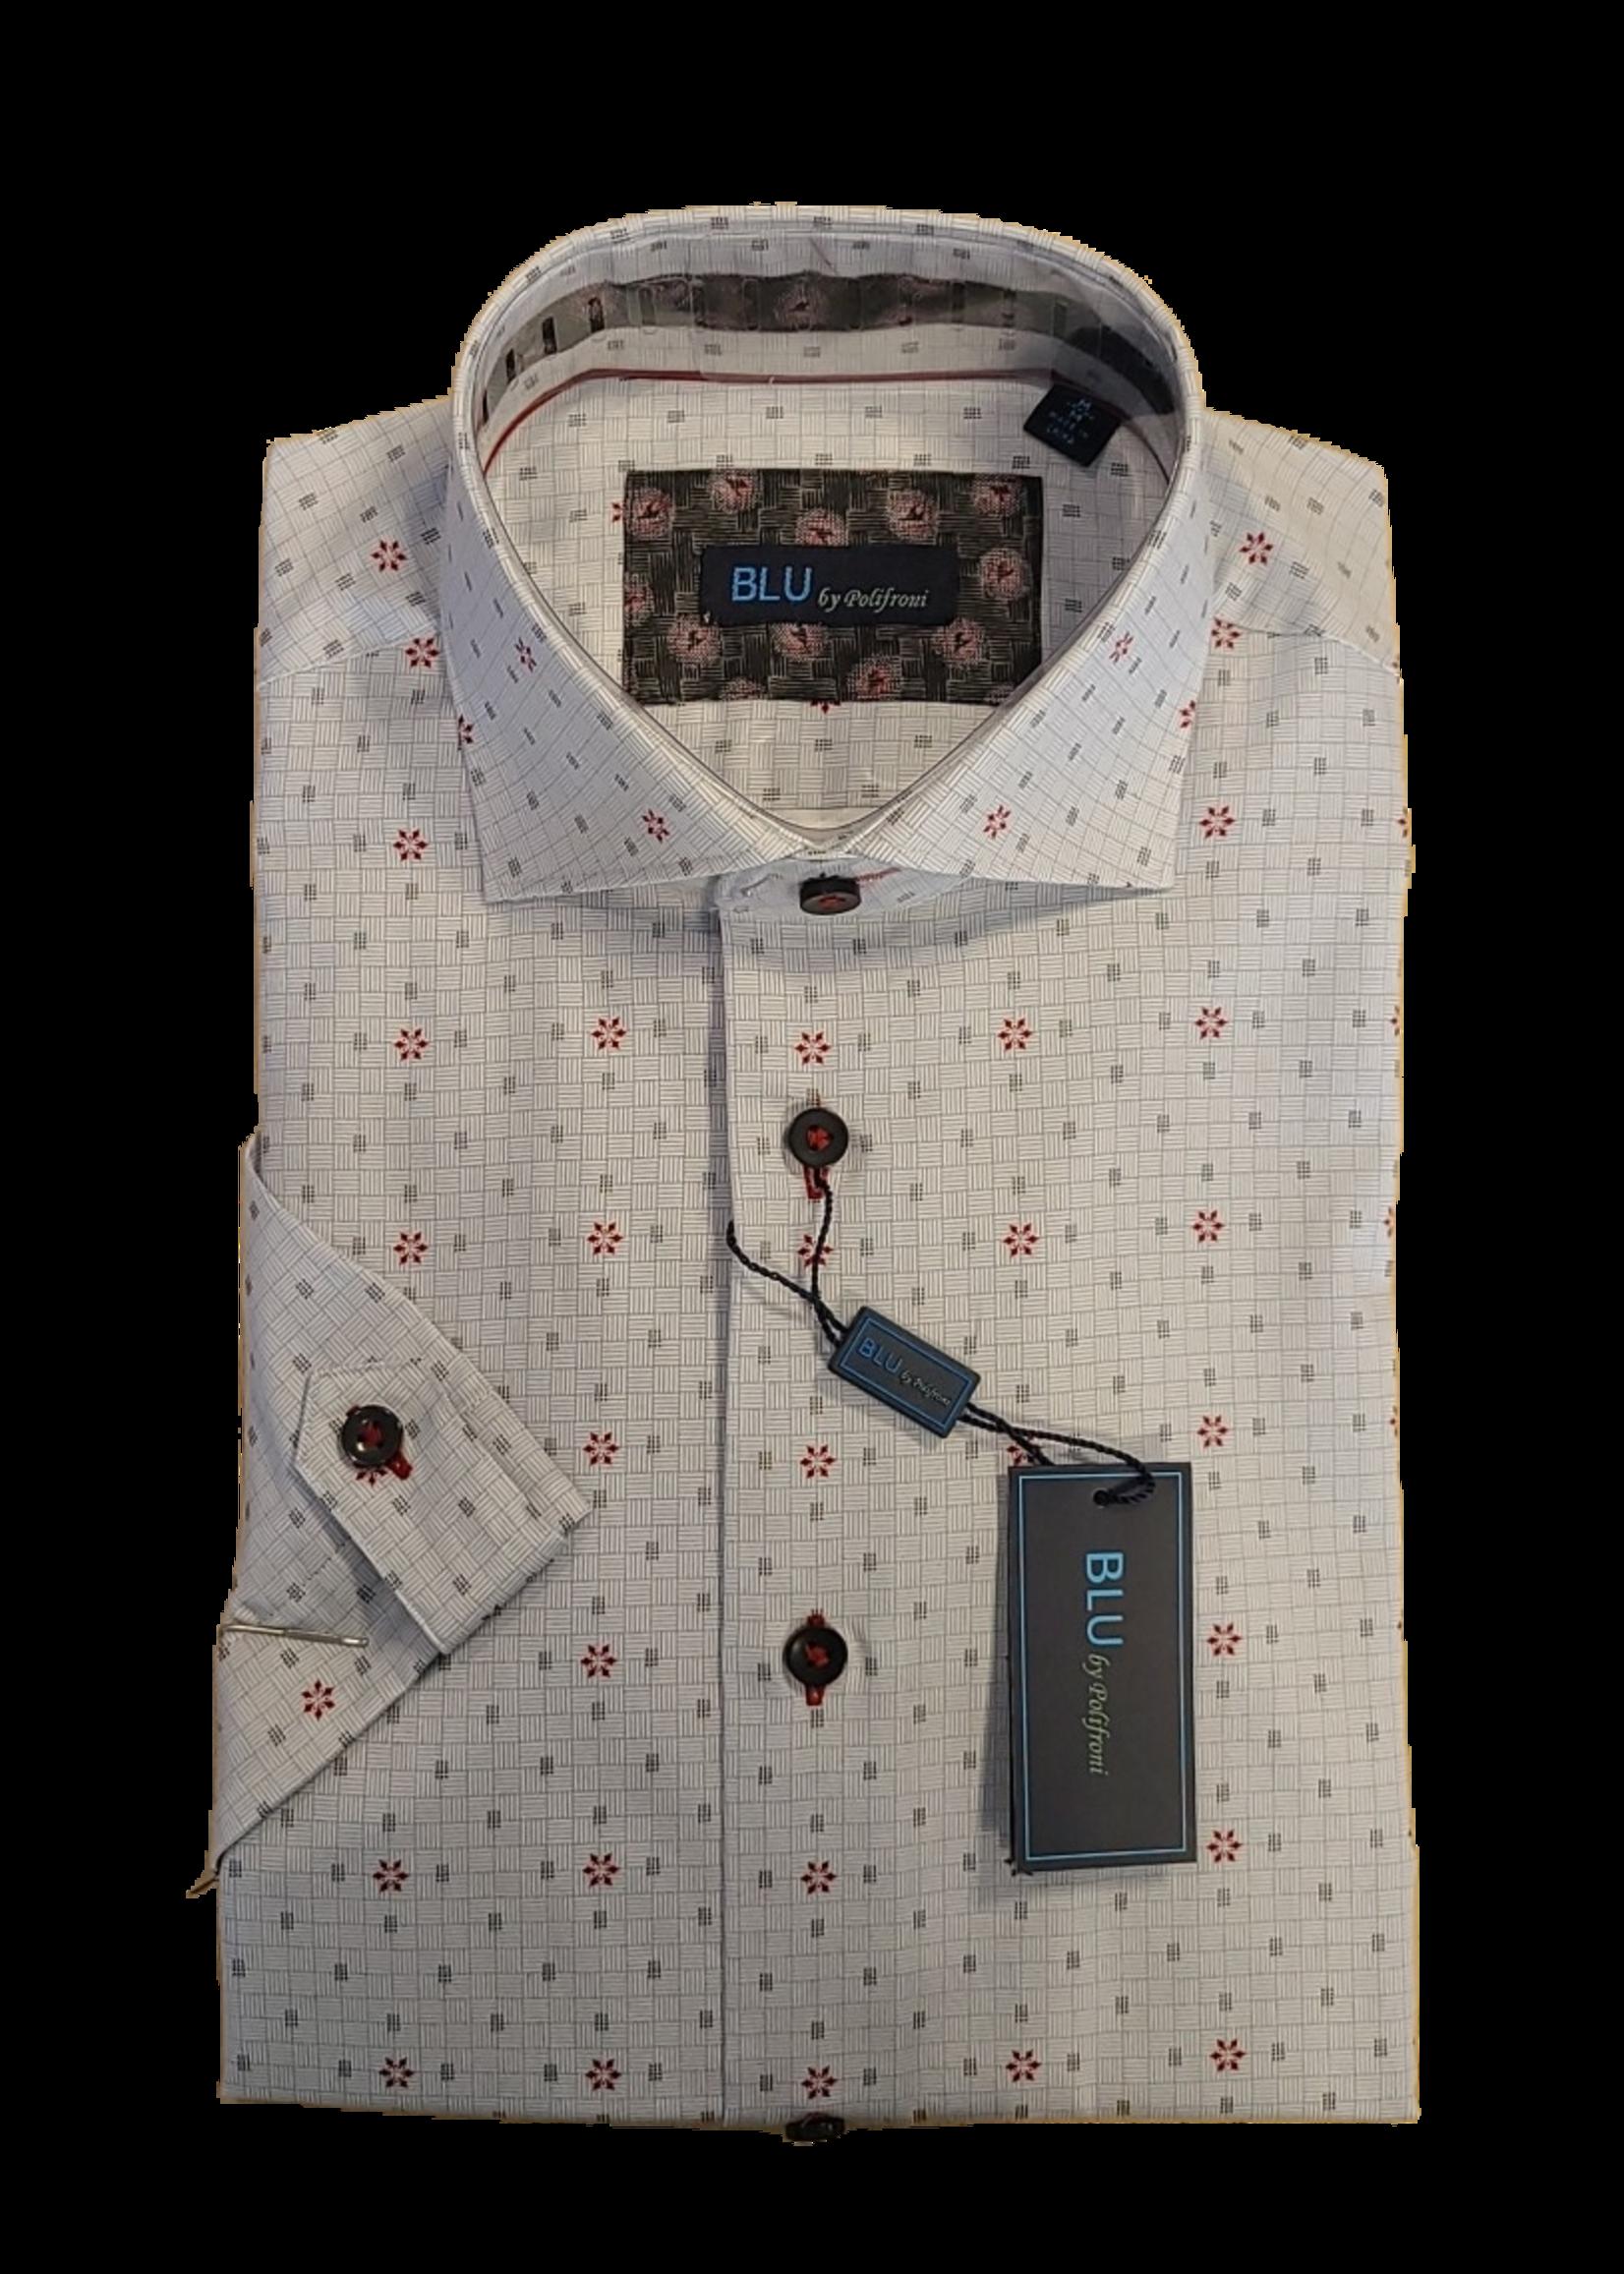 Blu Polifroni B-2045302 Blu Short Sleeve Shirt